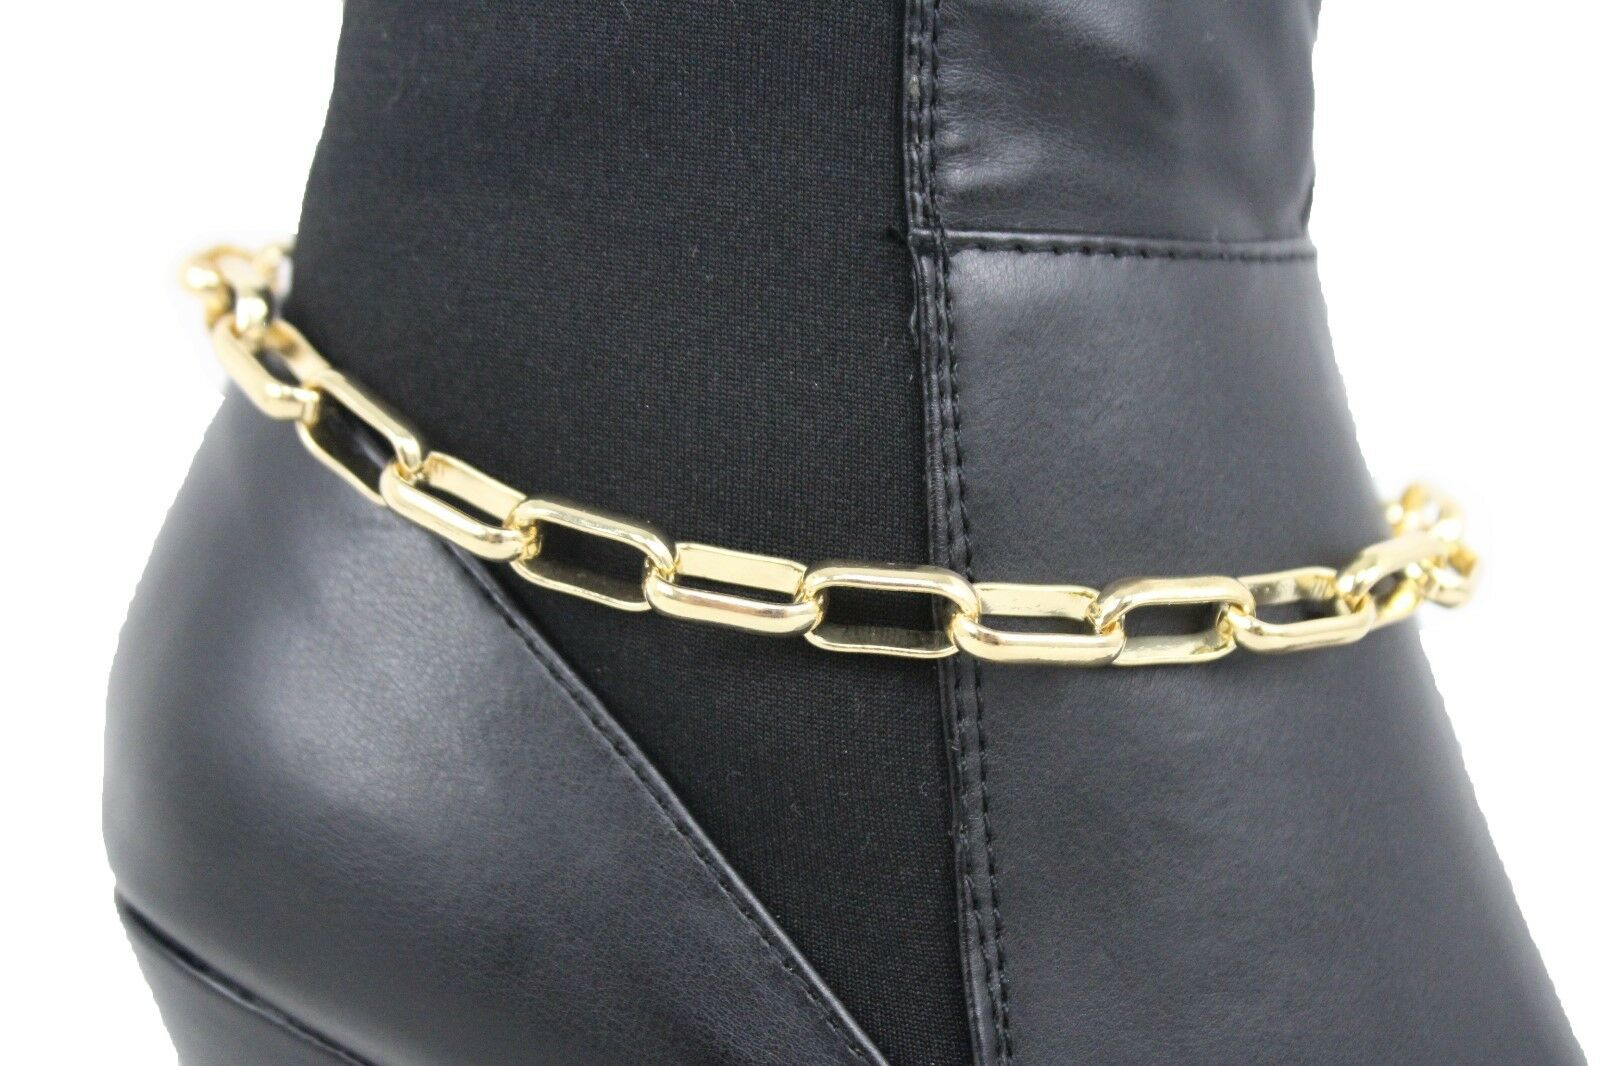 Women Boot Chain Gold Metal Long Link Band Shoe Classy Charm Anklet Biker Strap